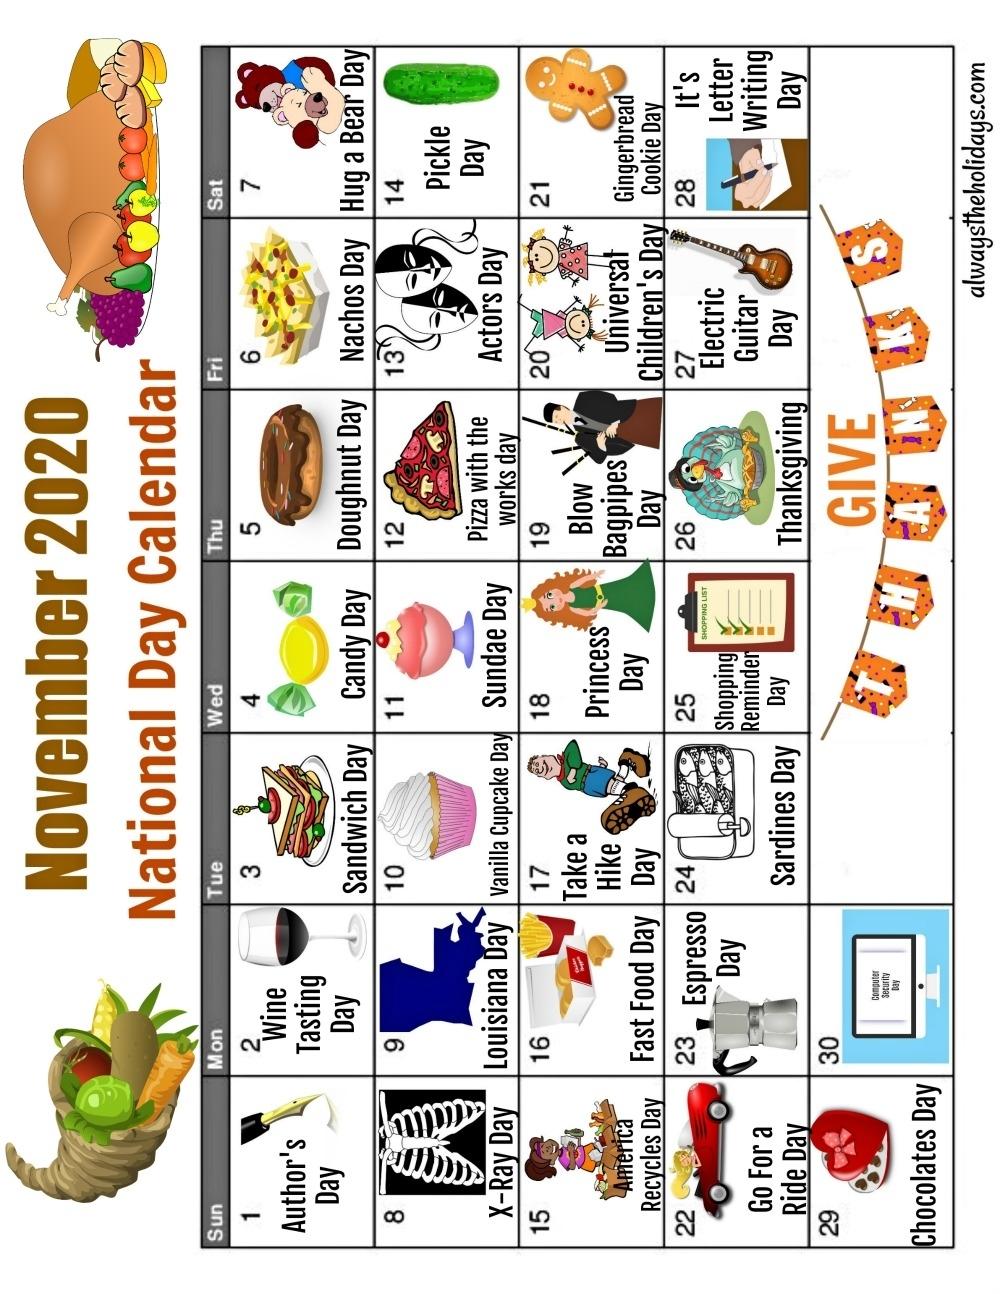 November National Day Calendar - Free Printable Calendars